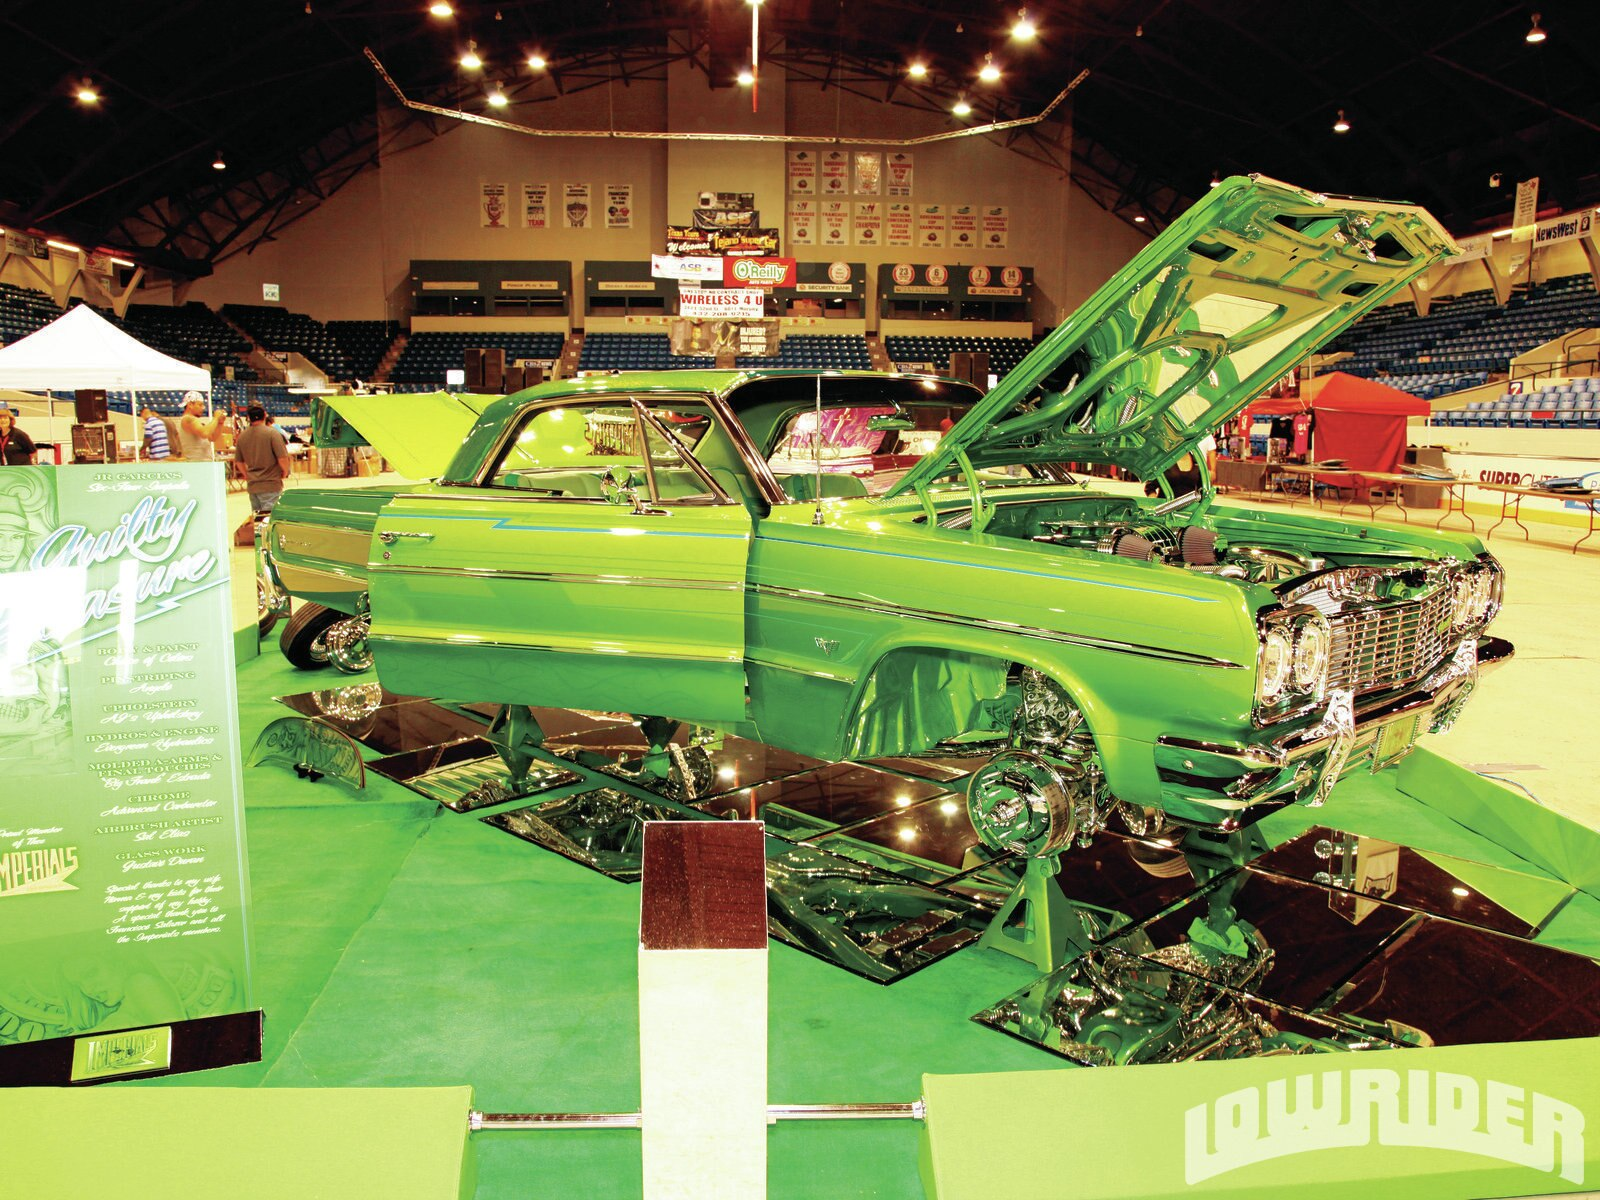 lrmp-1106-01-z-tejano-super-show-green-impala2